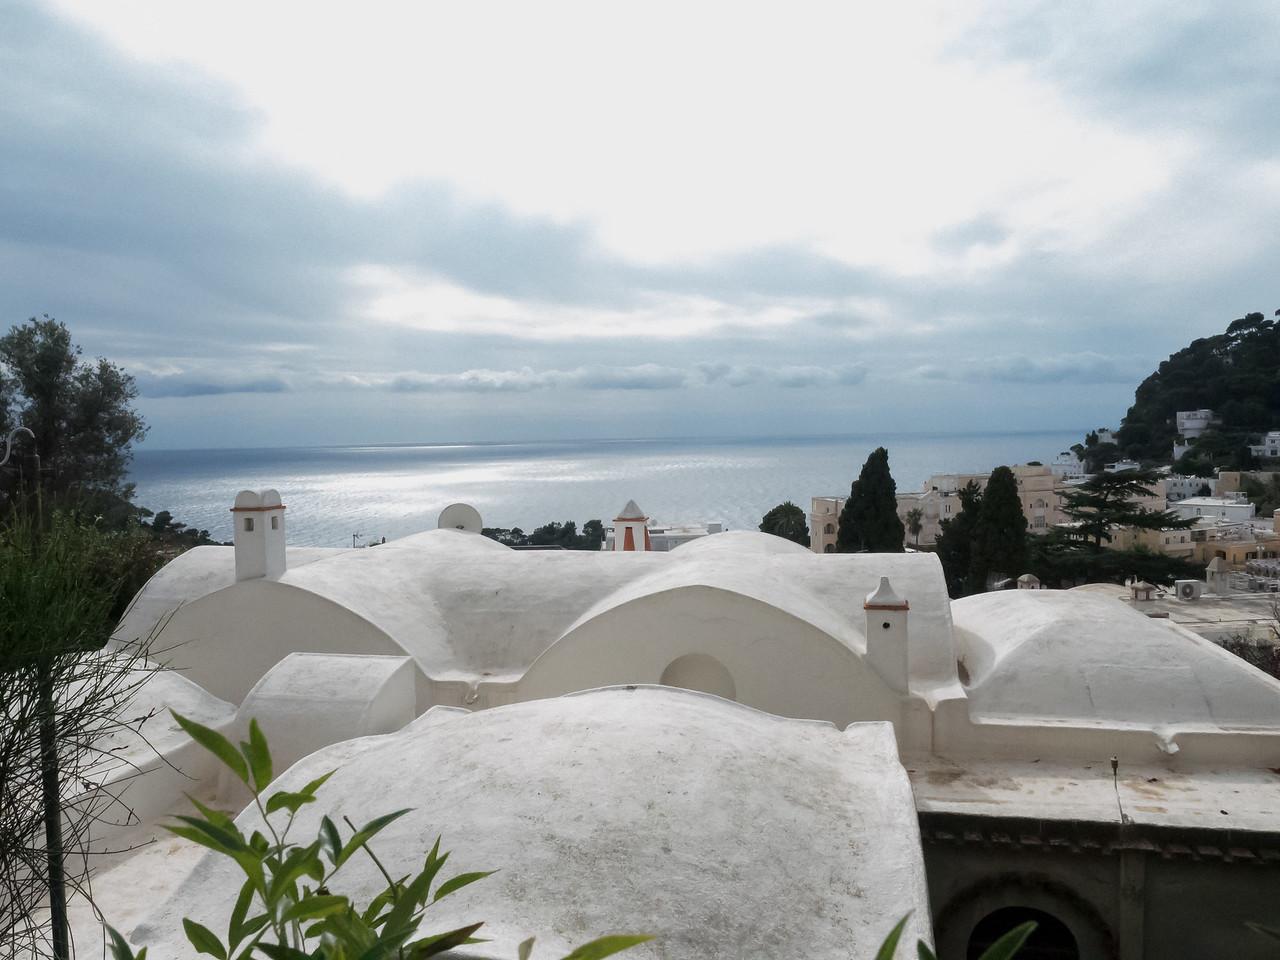 On the way to Villa Jovis, Capri